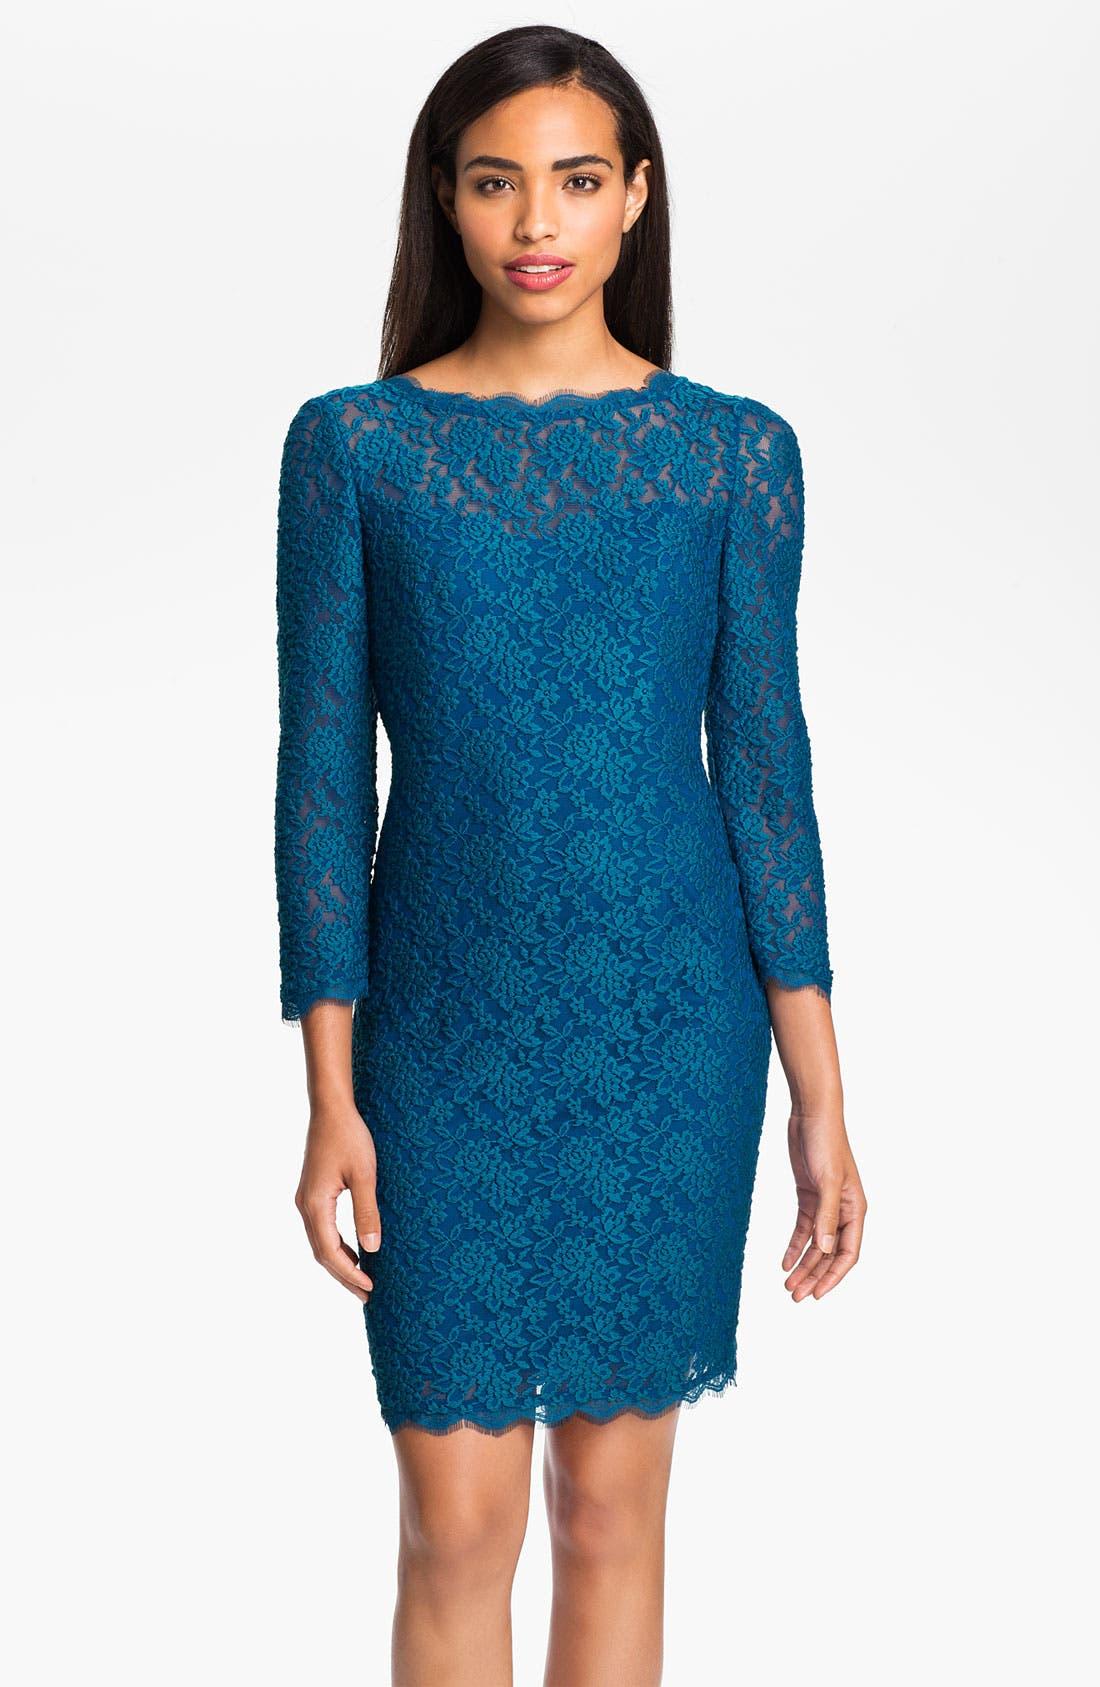 Alternate Image 1 Selected - Adrianna Papell V-Back Lace Sheath Dress